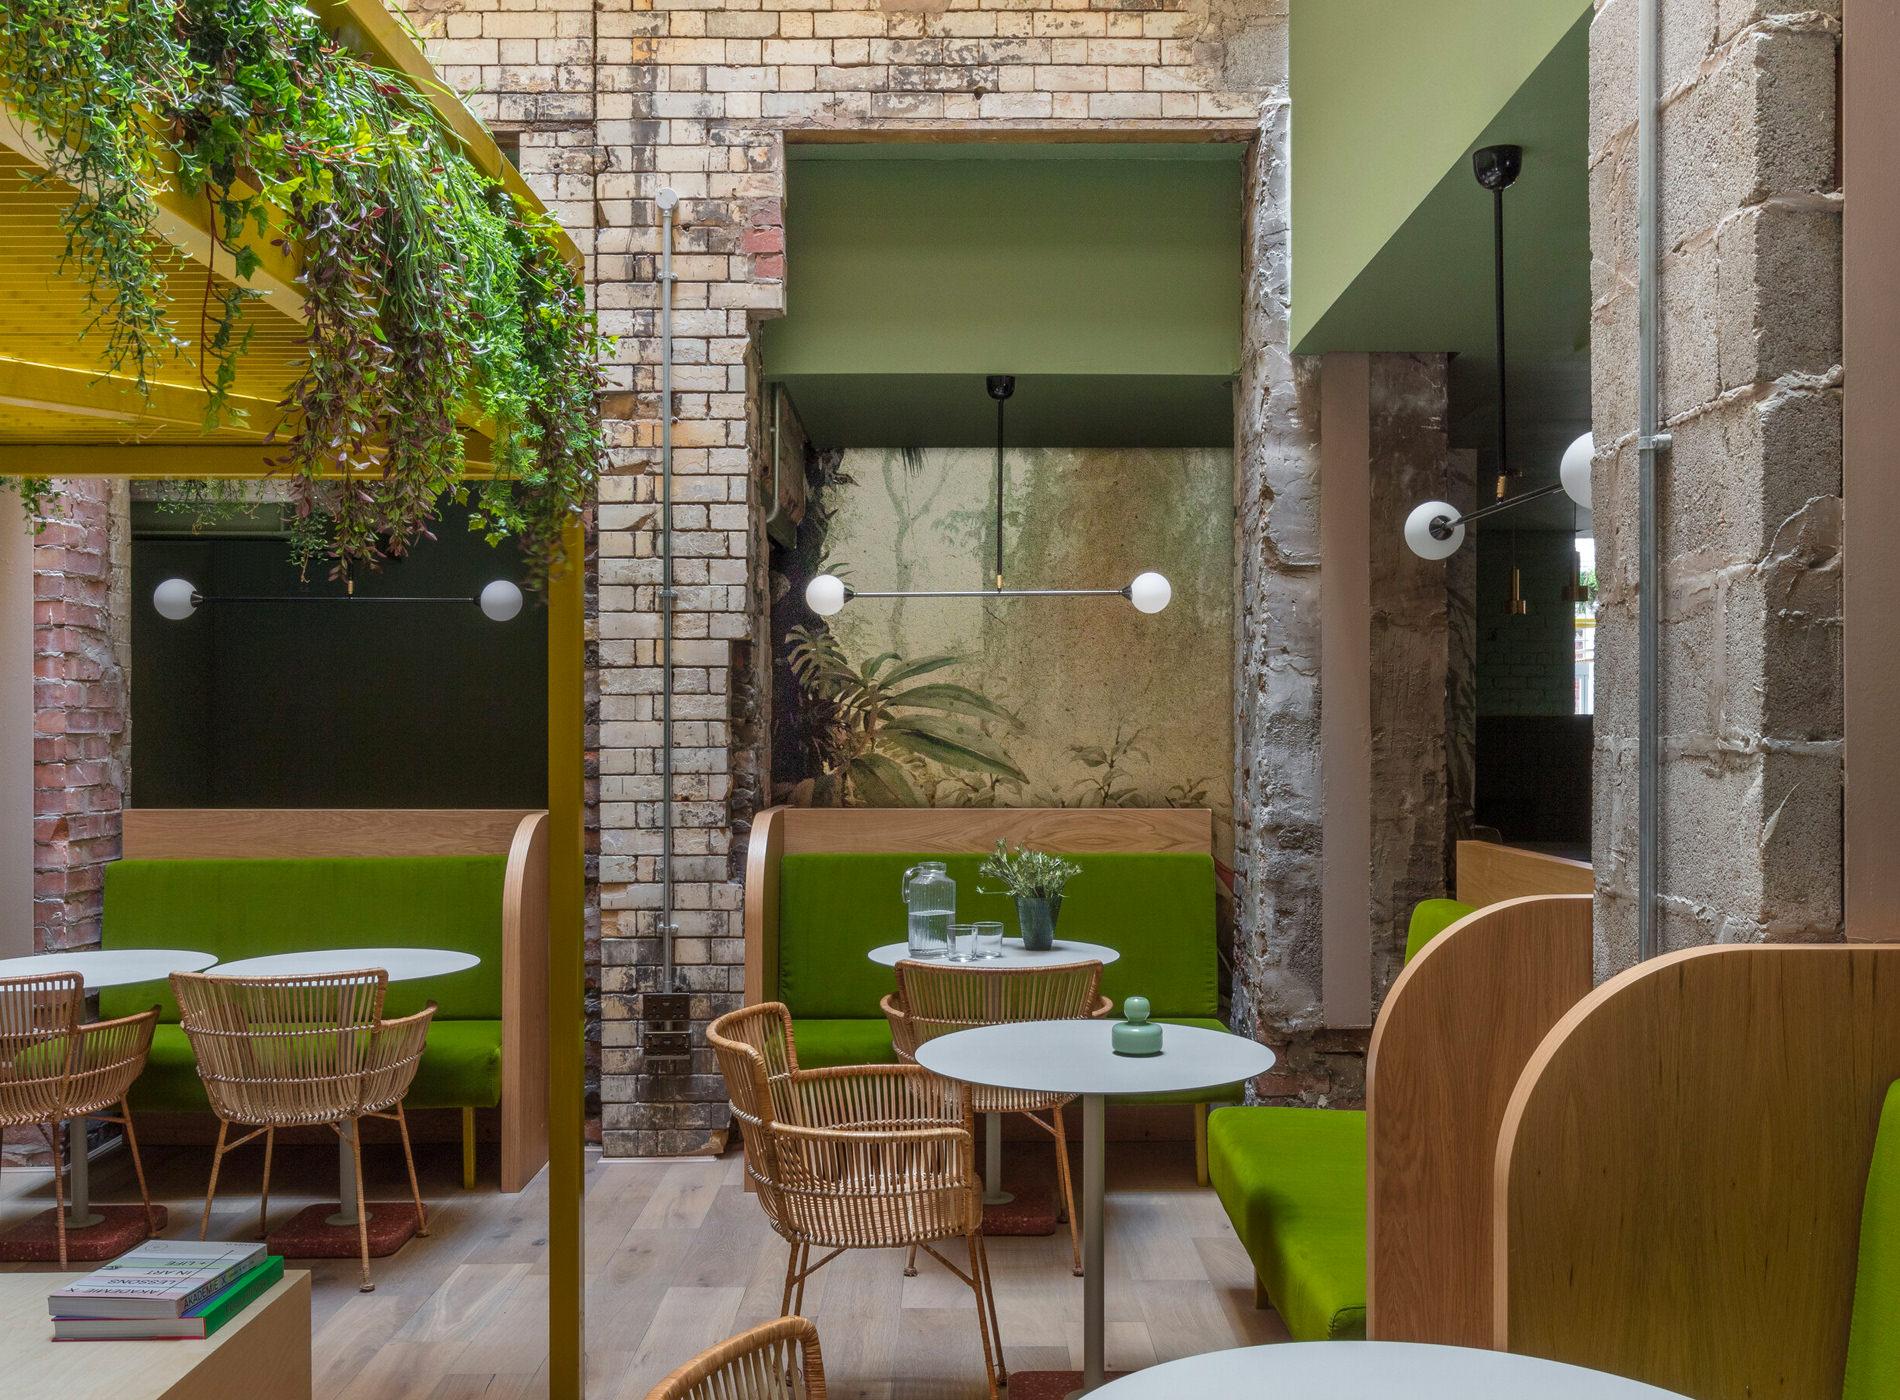 City Guide Manchester (Angleterre) Whitworth Locke Hotel — Princess Street